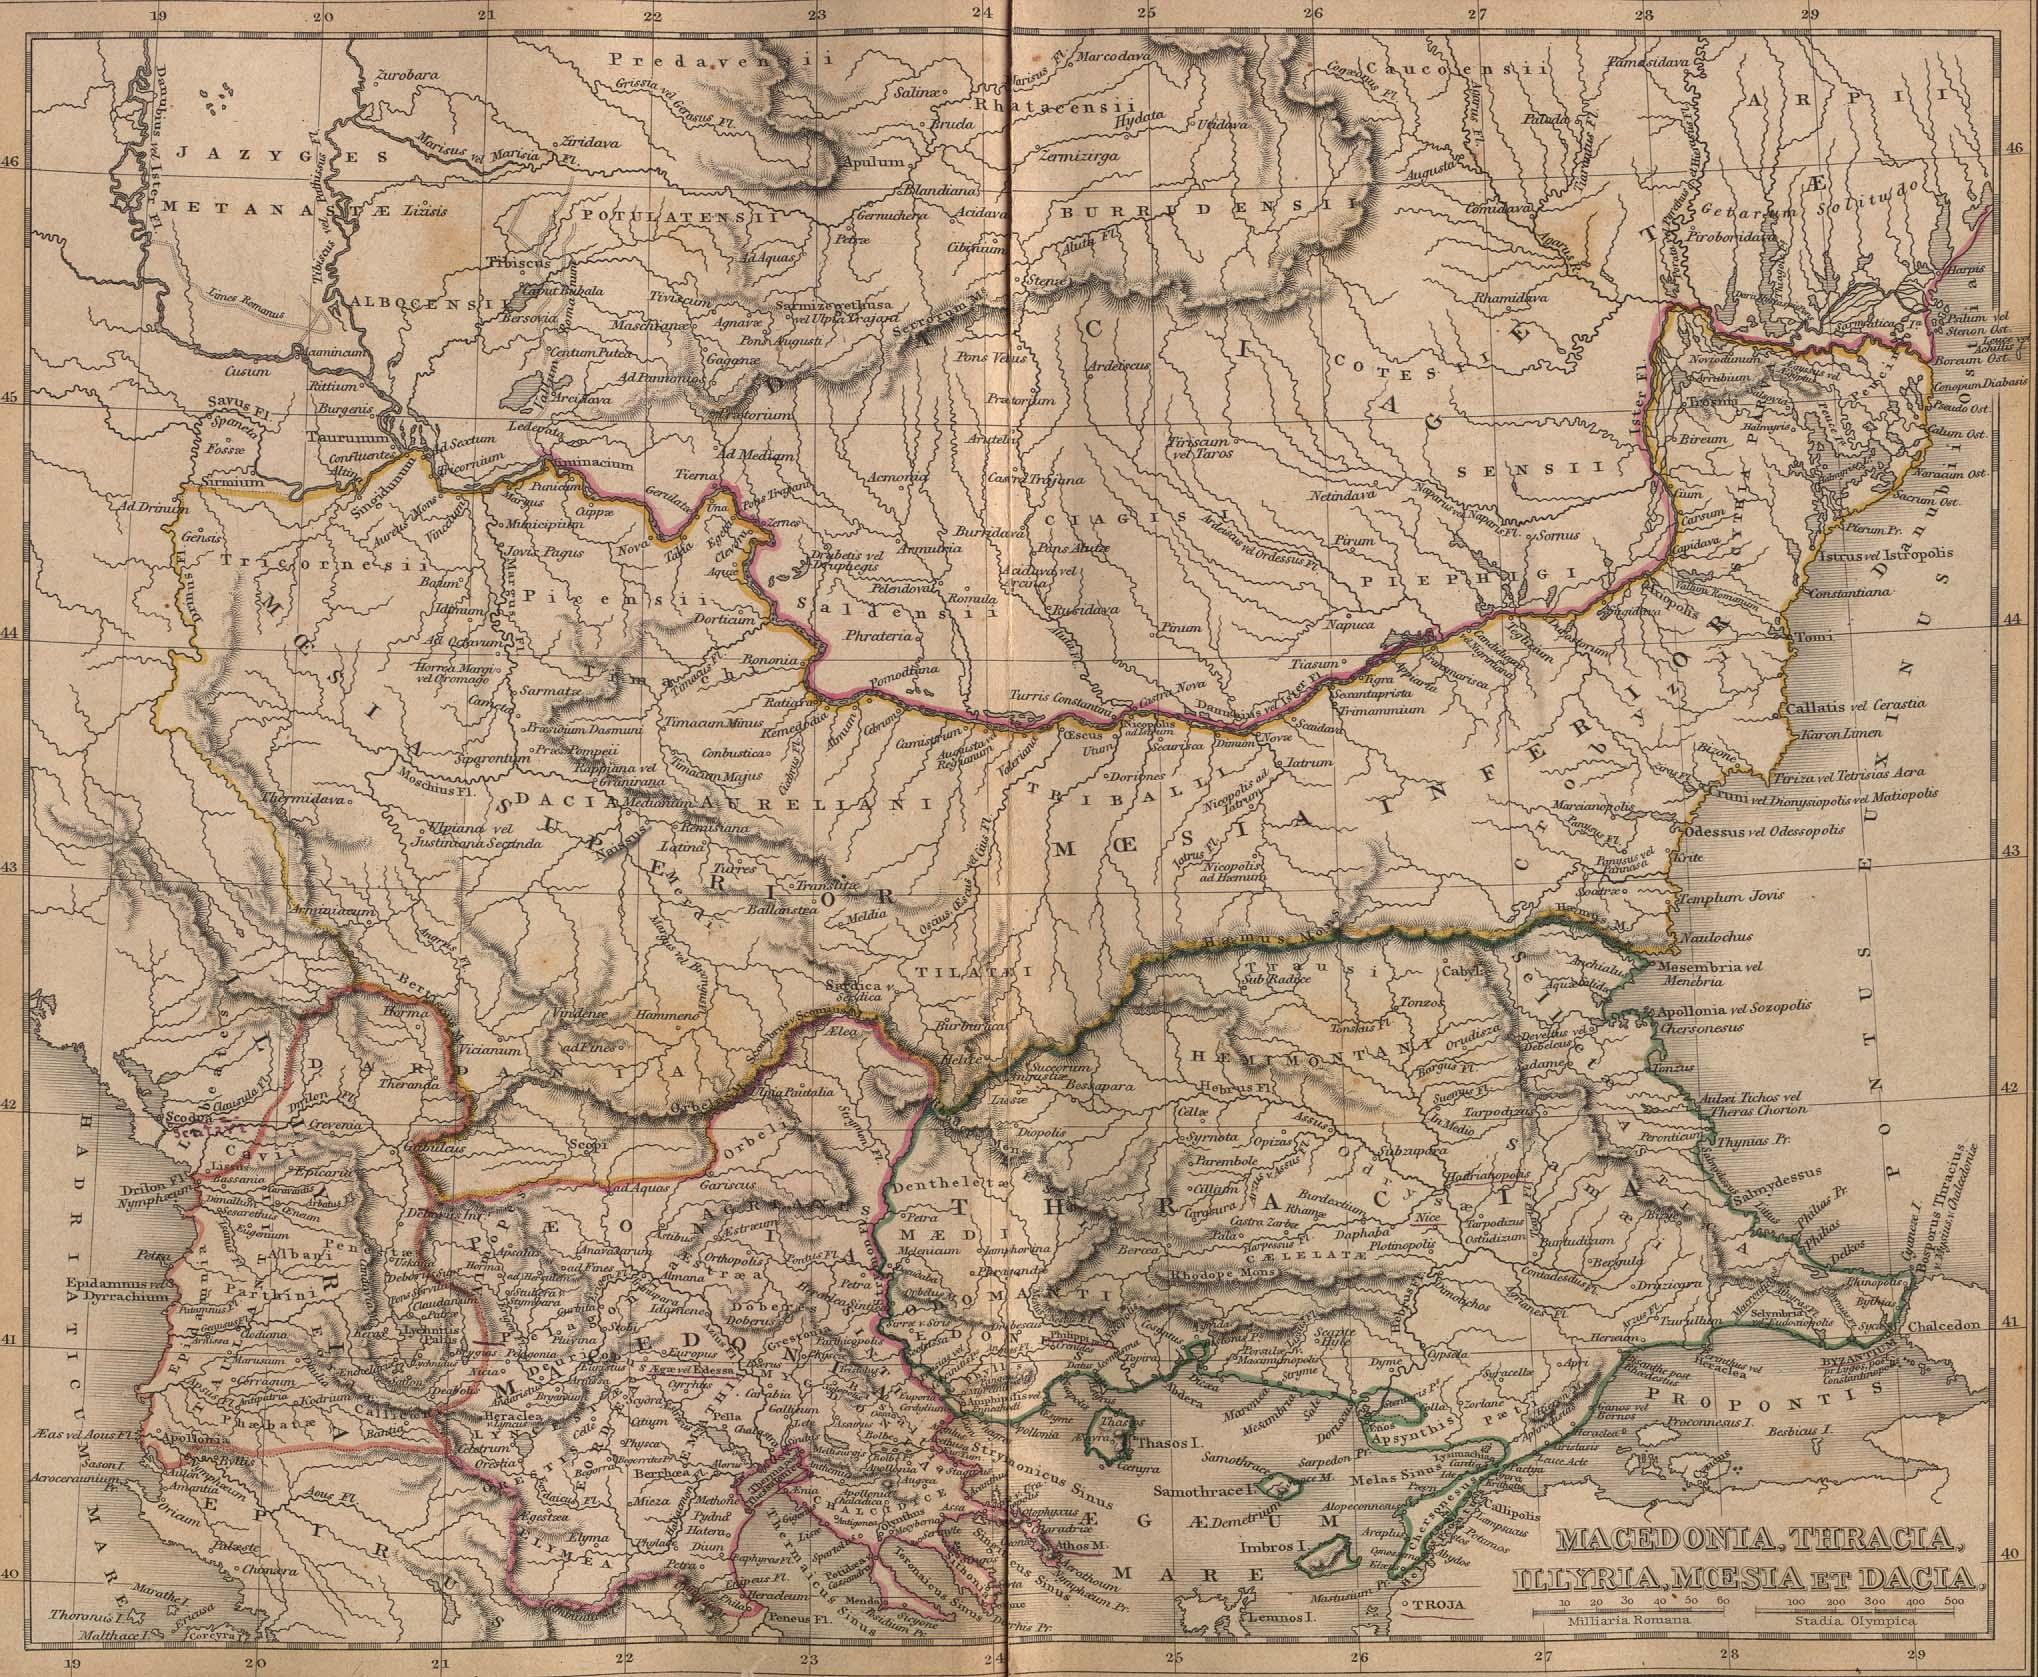 https://legacy.lib.utexas.edu/maps/historical/macedonia_1849.jpg